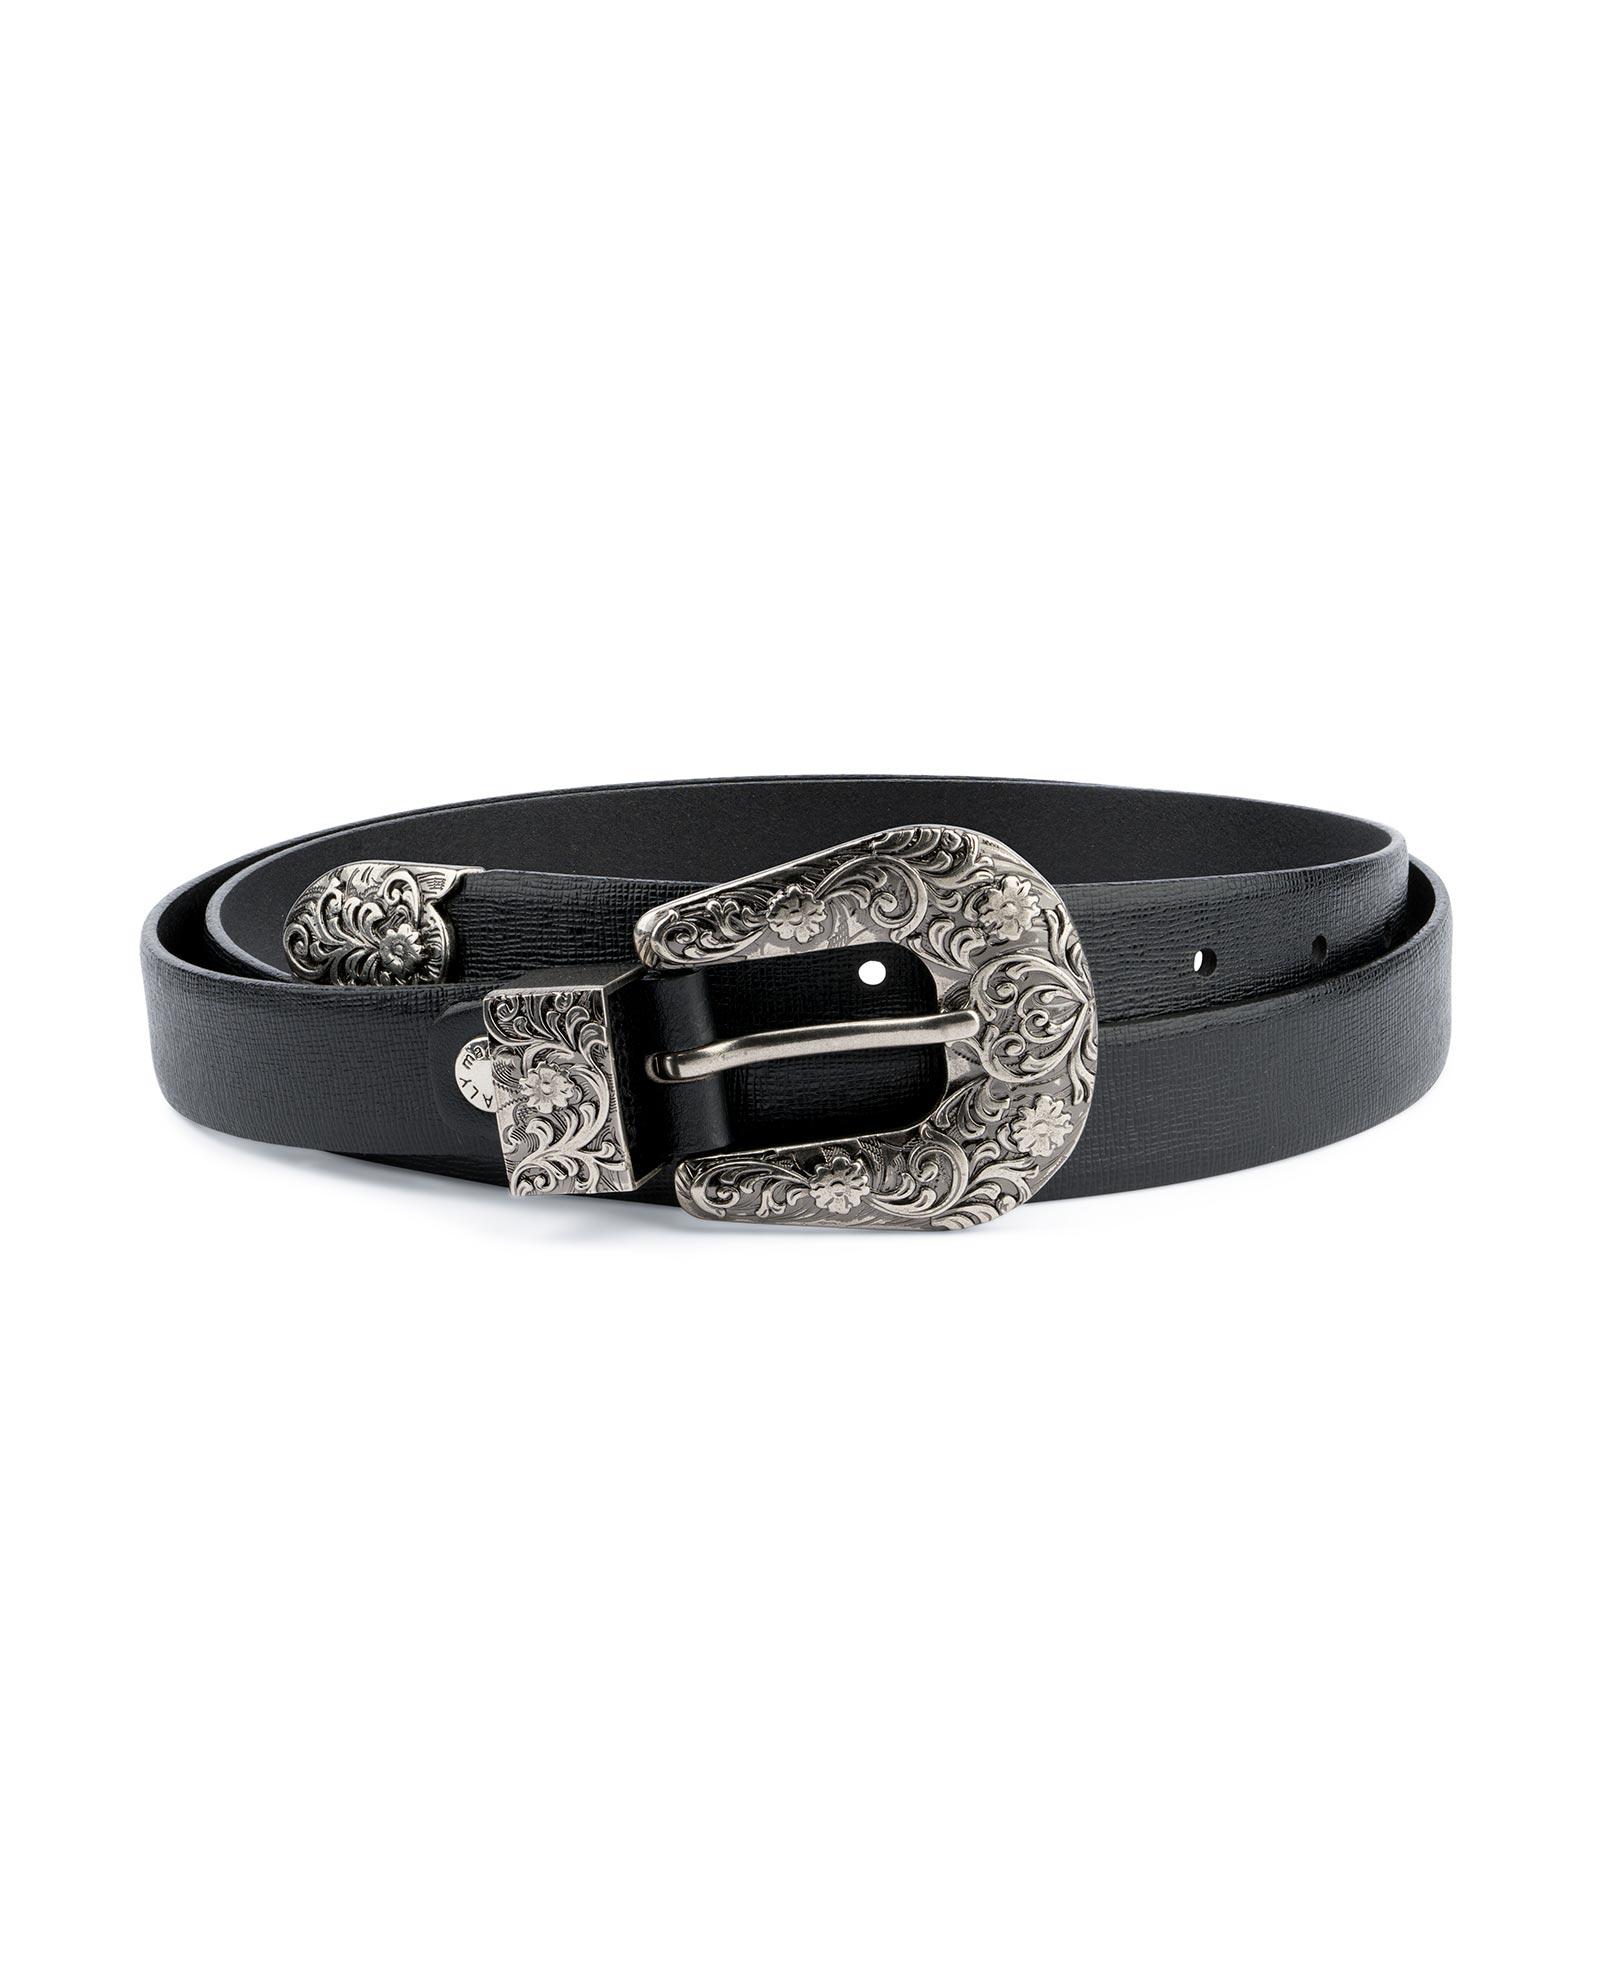 Buy Black Women's Belts For Dresses | Saffiano Leather | Capo Pelle